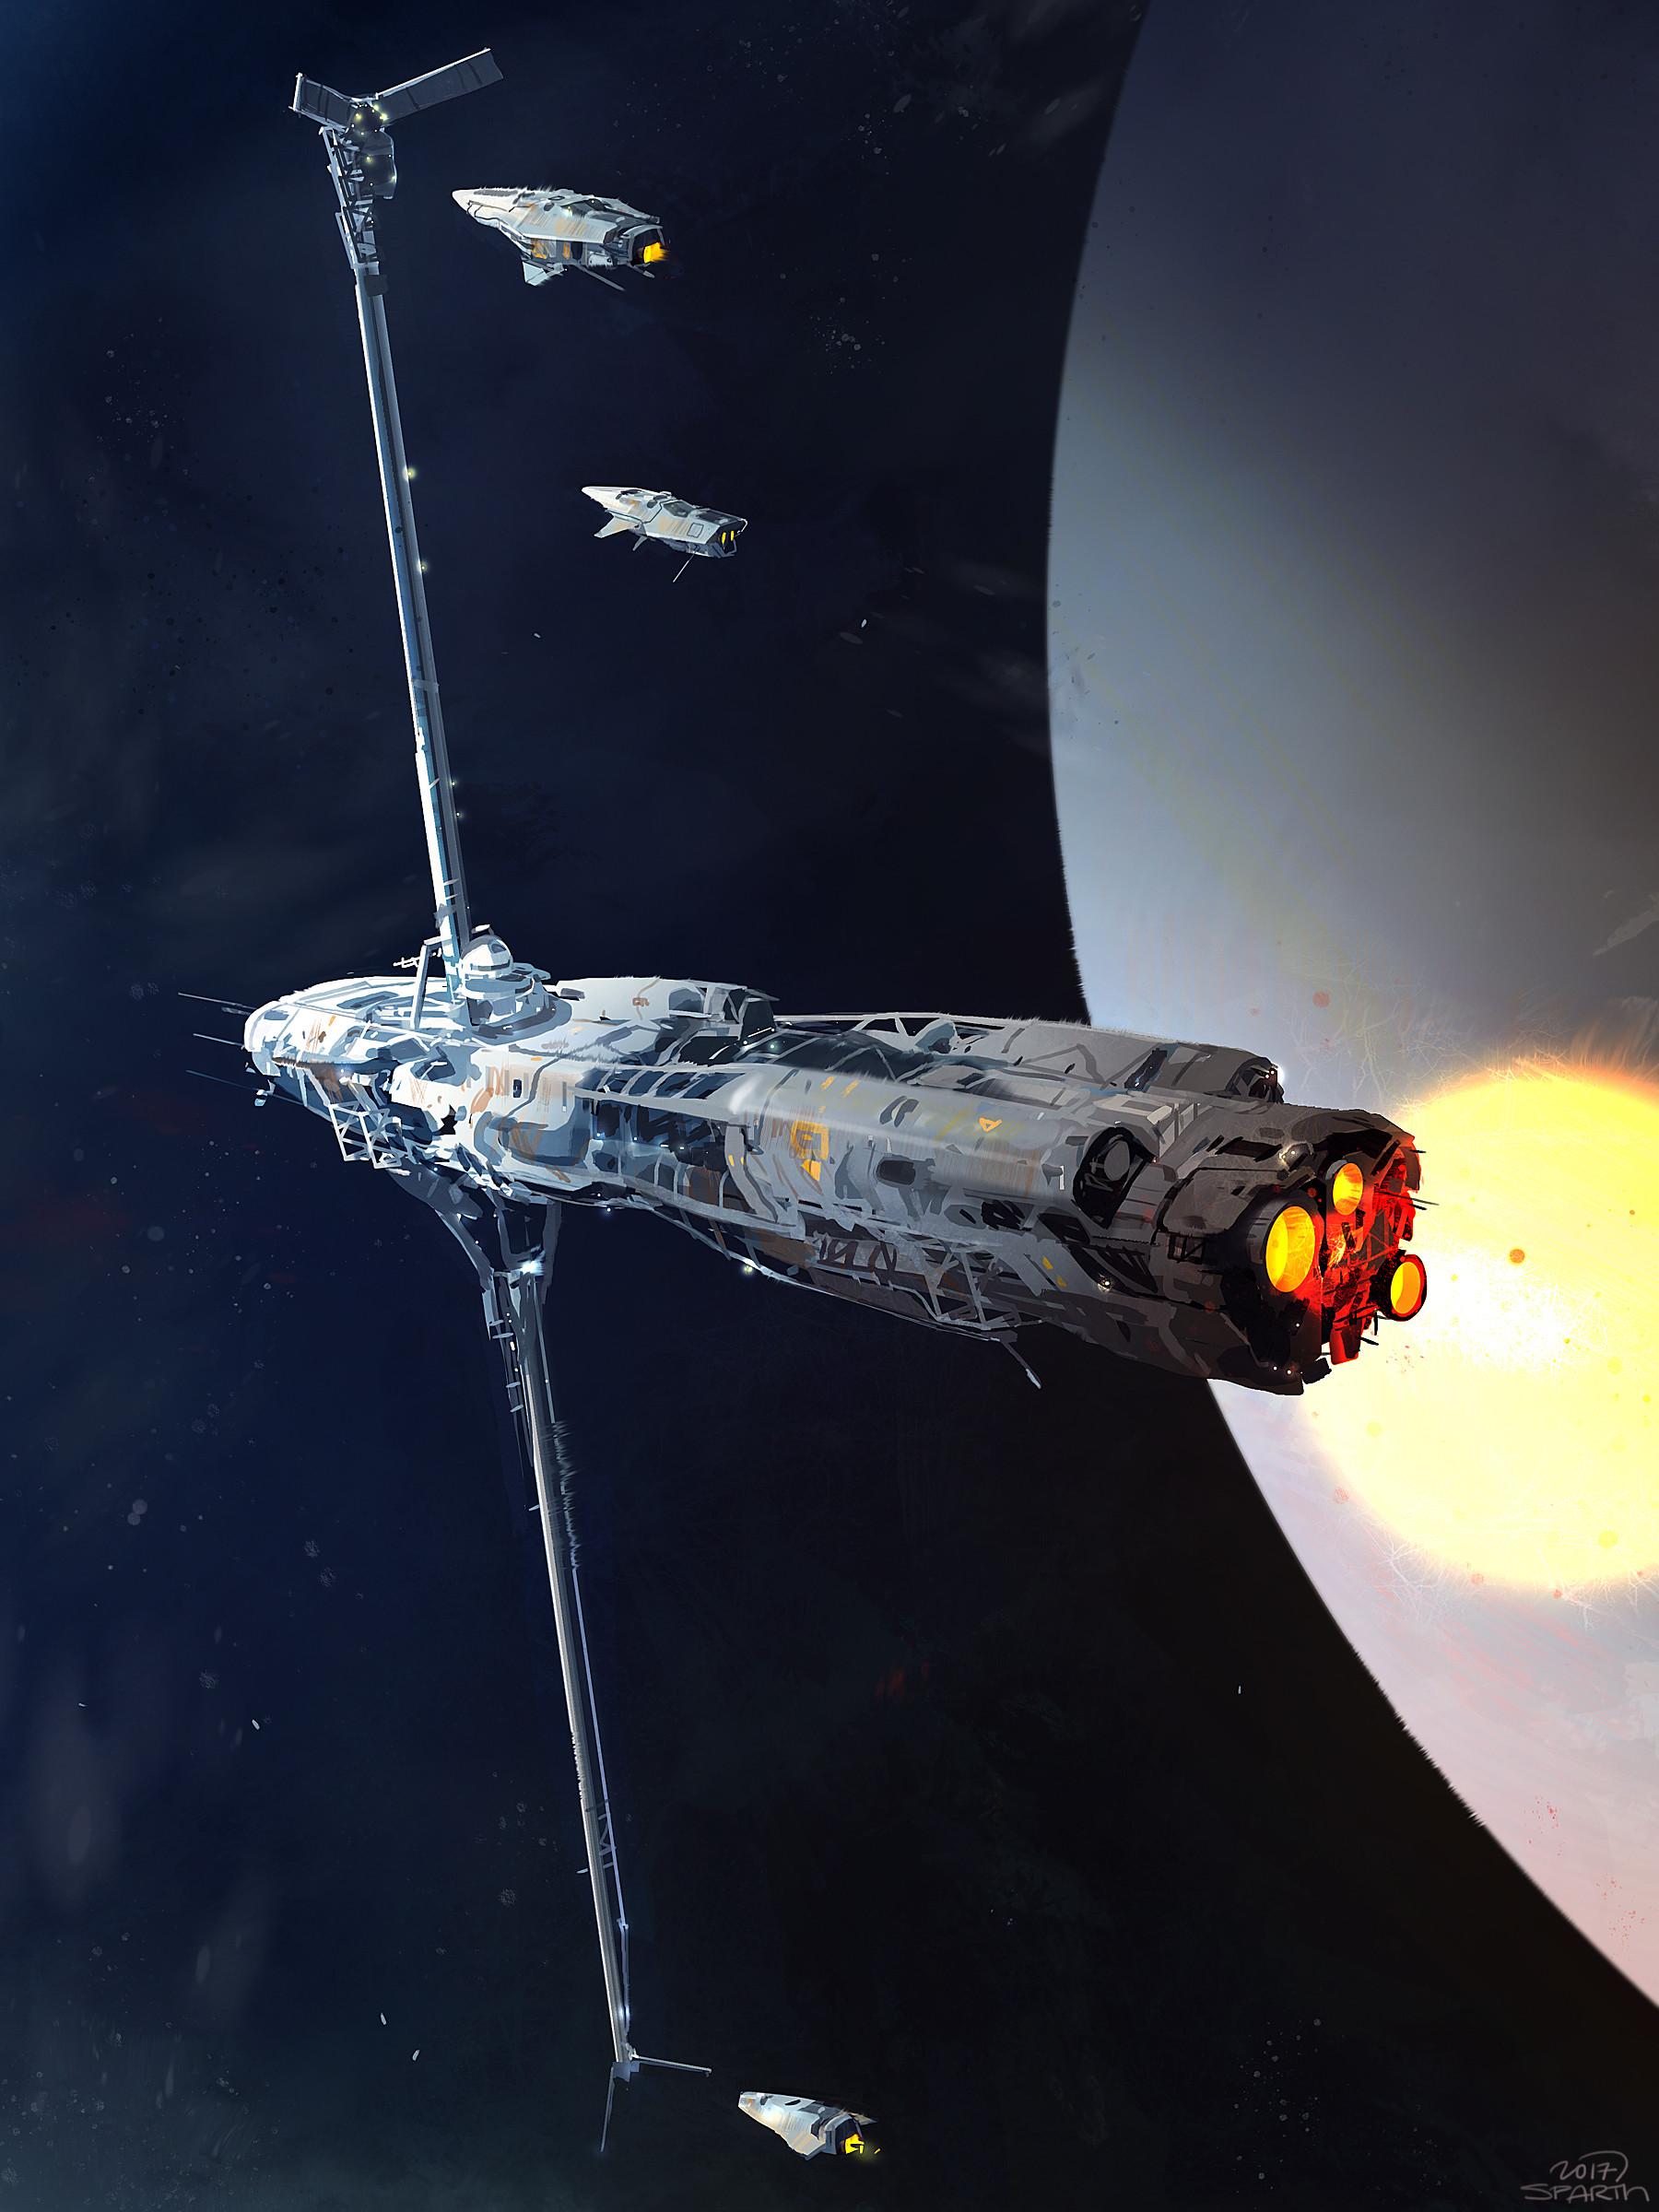 Artstation - Refueling Spaceship Sketch Sparth